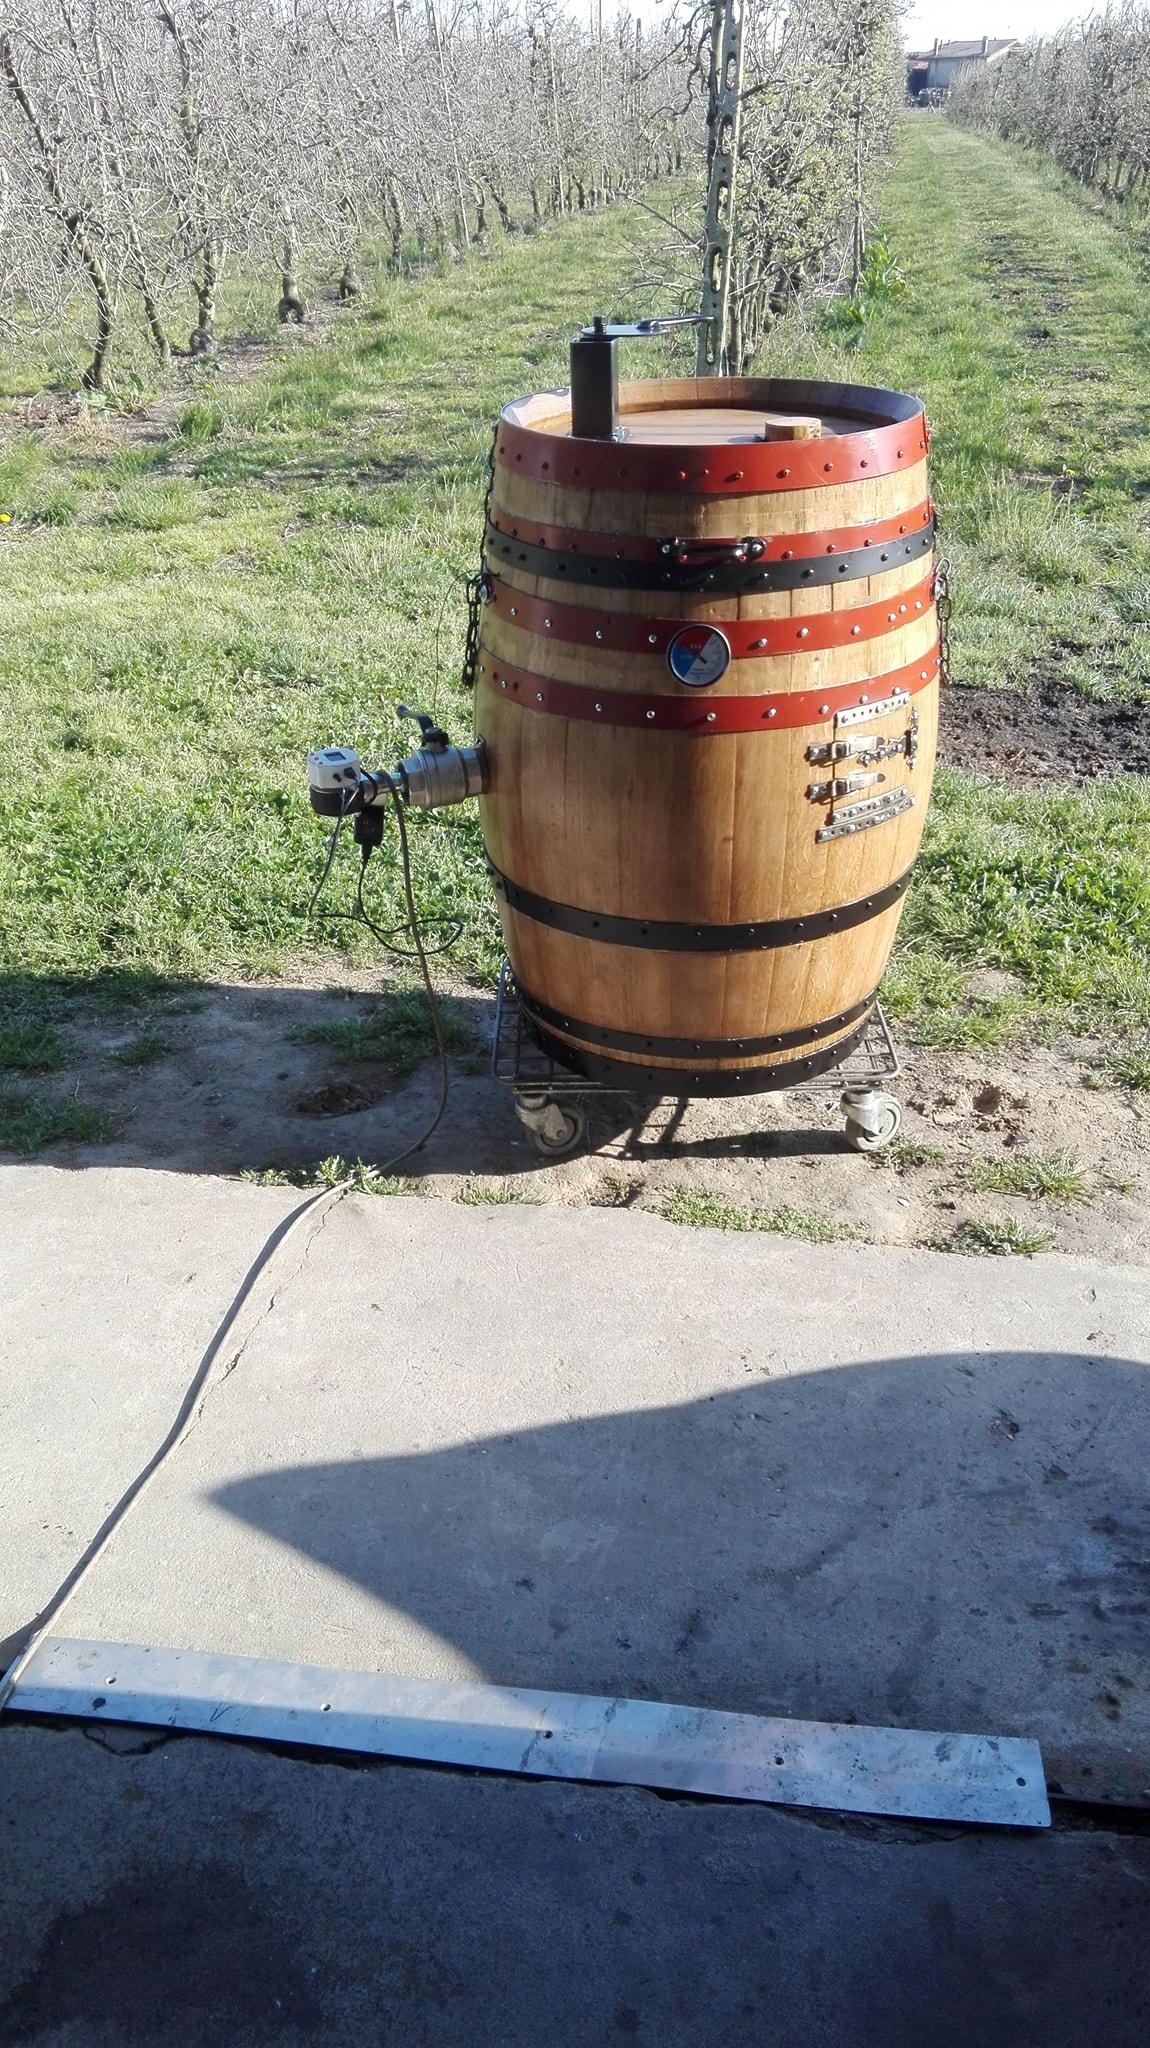 barrel smoker UDS smartpid BBQ easy controller